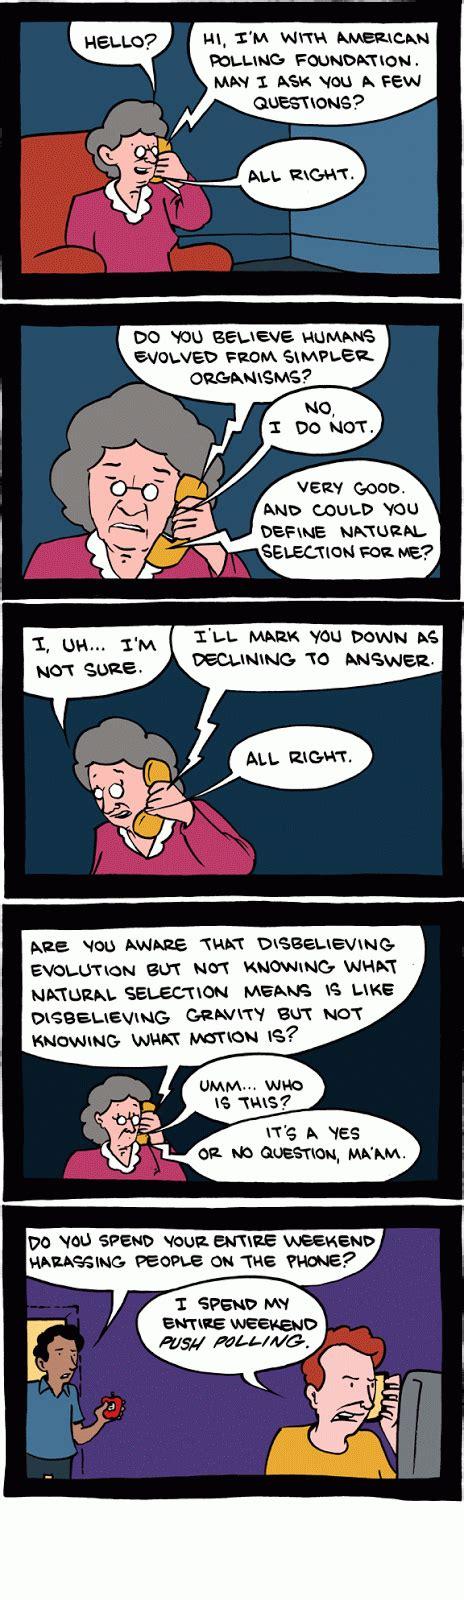 proto knowledge evolution of proto knowledge evolution vs gravity